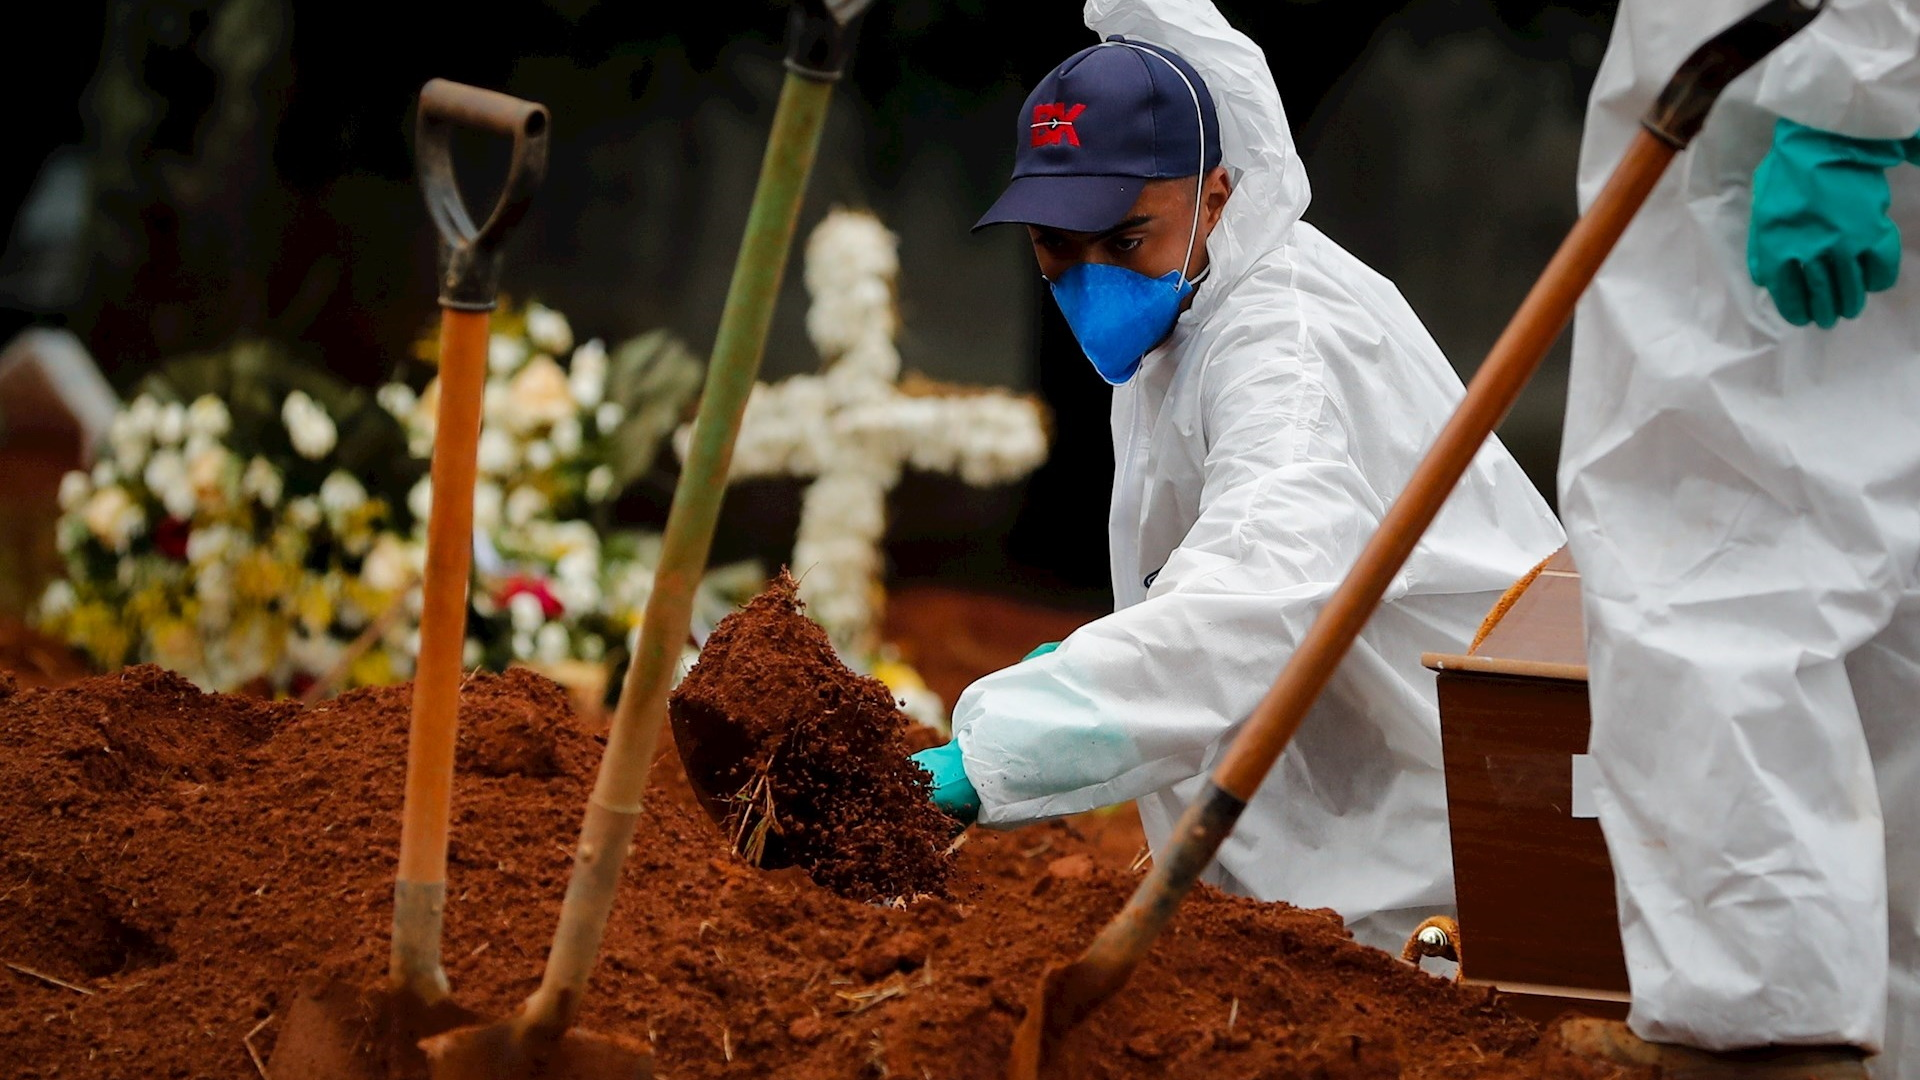 Brasil COVID-19 pandemia epidemia coronavirus pandemia